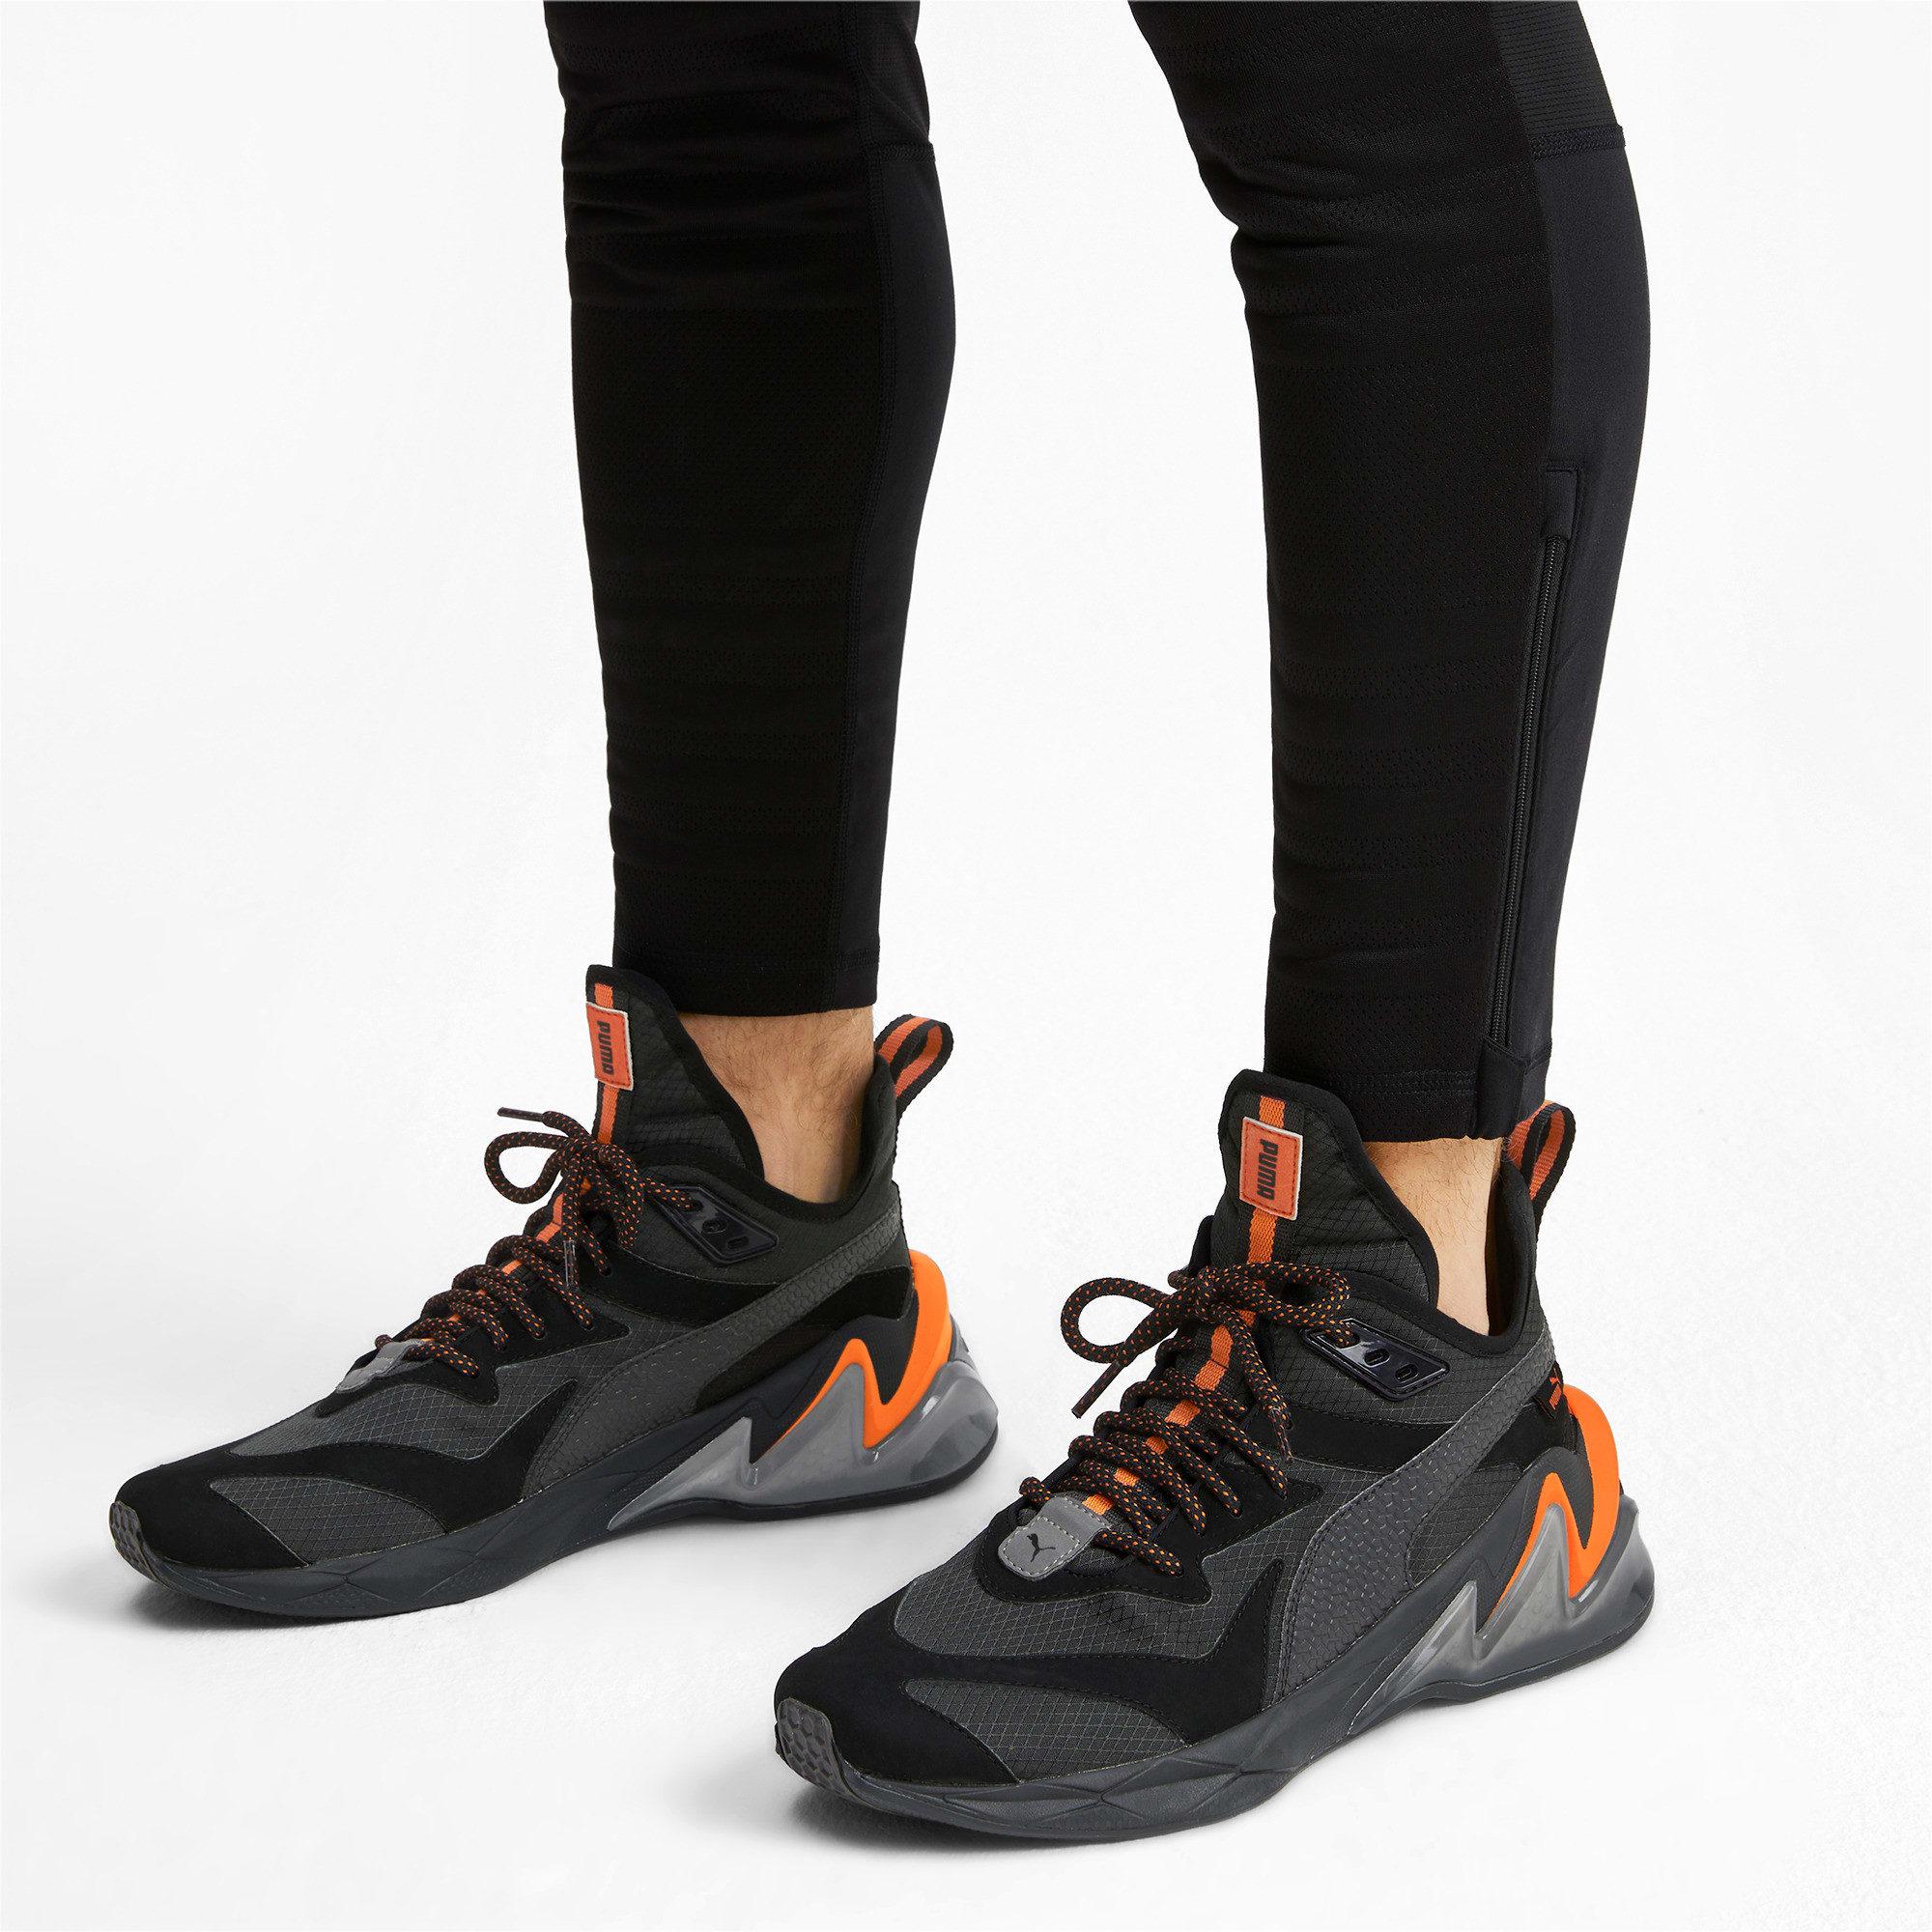 Thumbnail 2 of LQDCELL Origin Terrain Men's Training Shoes, Puma Black-Jaffa Orange, medium